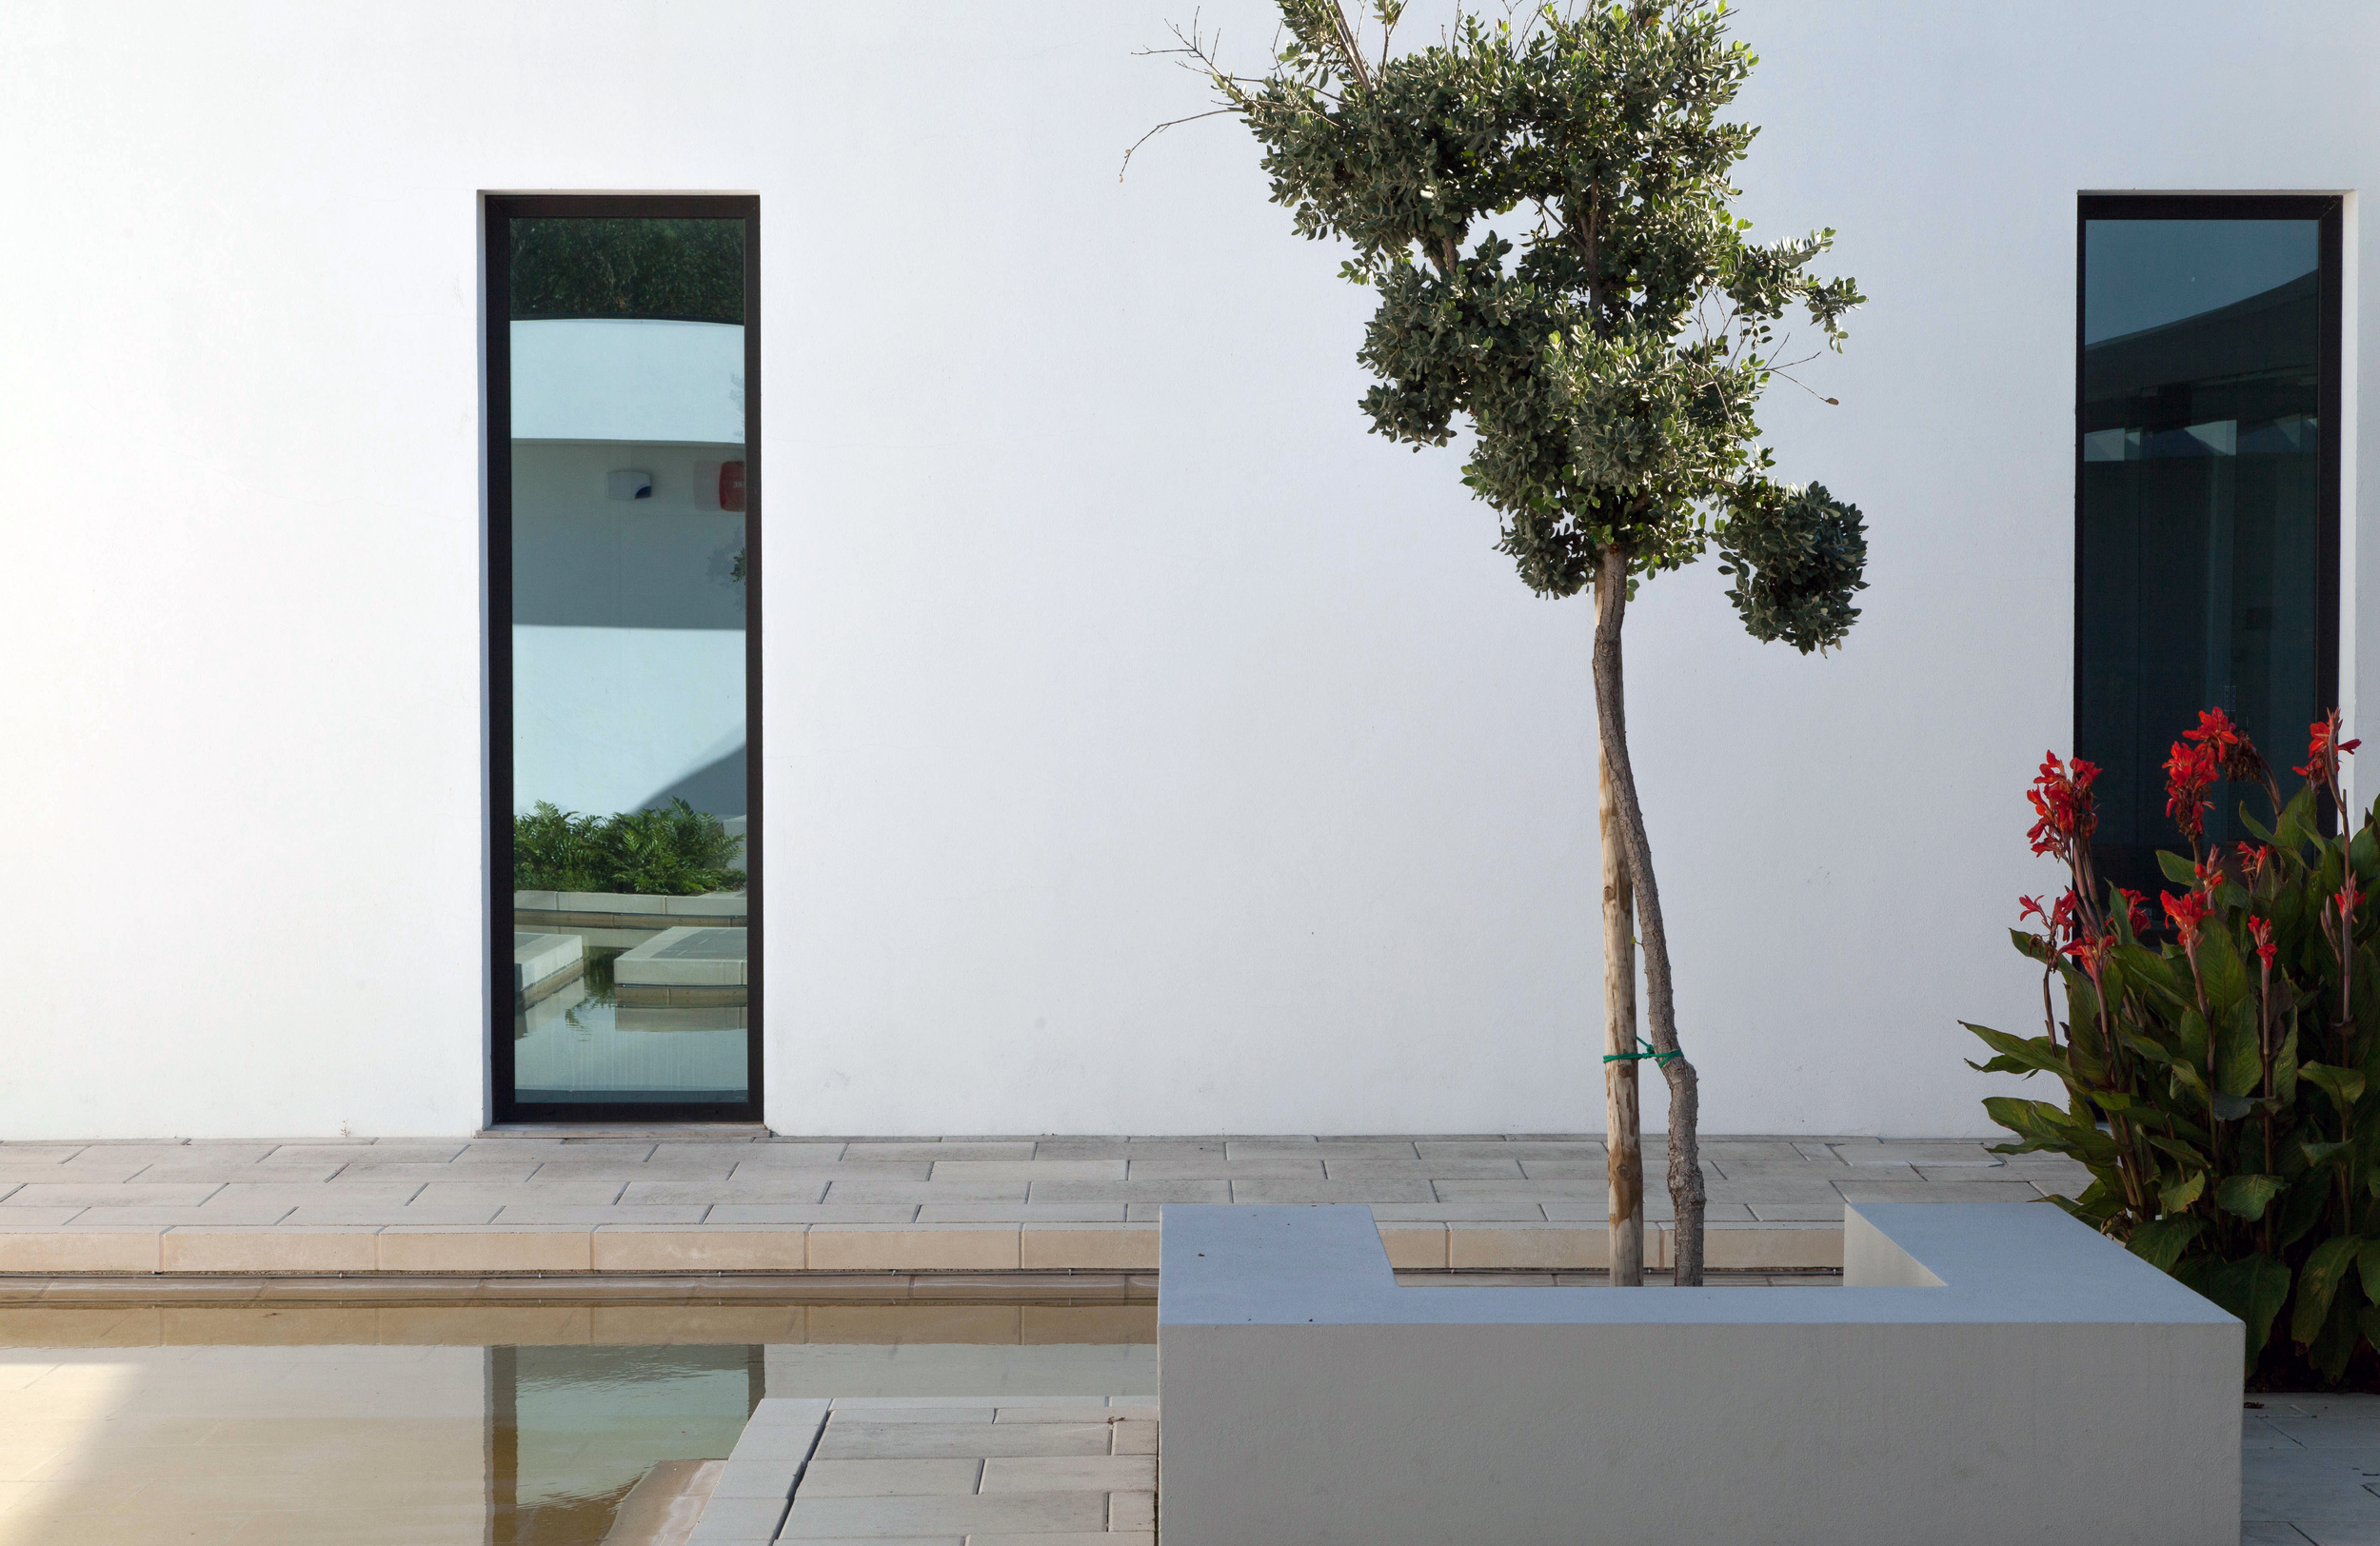 "Sustainable Architecture, Fogo Island, OTO arquitectos, Portuguese Architecture, Archdaily Building of the Year, Archmarathon Overall winner,       Normal   0       21       false   false   false     PT   X-NONE   X-NONE                                                                                                                                                                                                                                                                                                                                                                                                                                                                                                                                                                                                                                                                                                                                                                                                                                                                                    /* Style Definitions */ table.MsoNormalTable {mso-style-name:""Tabela normal""; mso-tstyle-rowband-size:0; mso-tstyle-colband-size:0; mso-style-noshow:yes; mso-style-priority:99; mso-style-parent:""""; mso-padding-alt:0cm 5.4pt 0cm 5.4pt; mso-para-margin:0cm; mso-para-margin-bottom:.0001pt; mso-pagination:widow-orphan; font-size:12.0pt; font-family:Calibri; mso-ascii-font-family:Calibri; mso-ascii-theme-font:minor-latin; mso-hansi-font-family:Calibri; mso-hansi-theme-font:minor-latin;}     projecto de arquitectura, arquitectura obra, arquitecto preço, arquitectura, arquitectura de interiores, projecto de execução, arquitectura algarve, reabilitação apartamentos, arquitectura low cost, best architects, arquitectura sustentável, arquitectura bioclimática, arquitectura e reabilitação, reabilitação Lisboa"